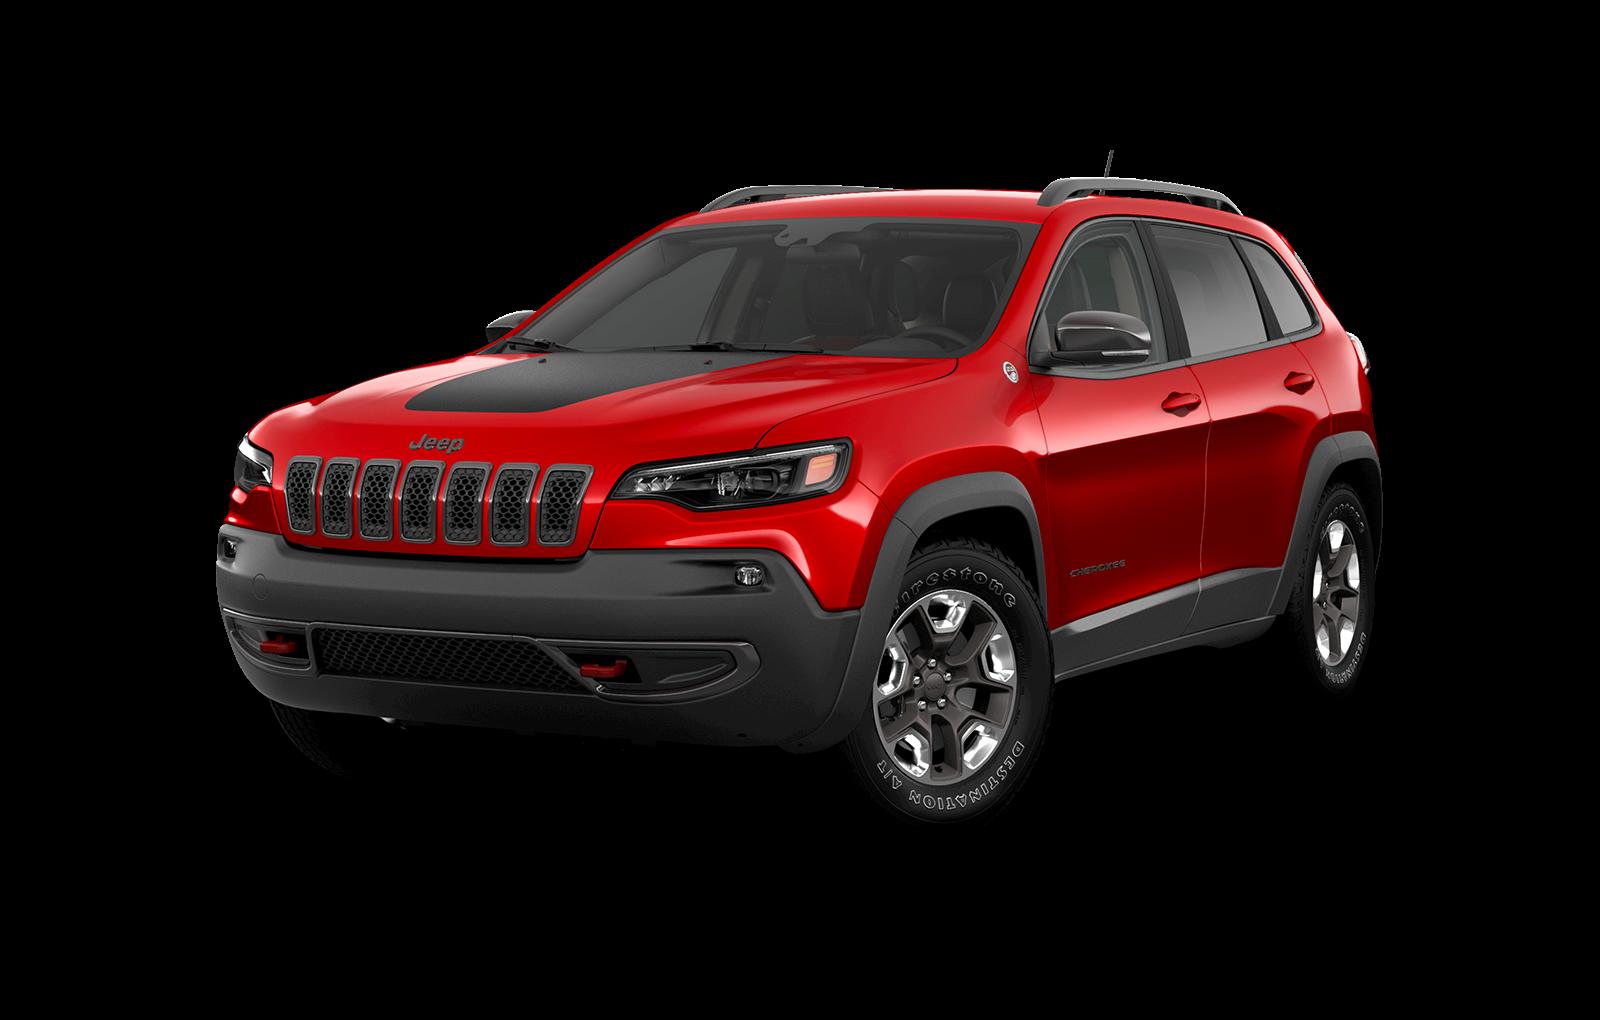 Hyundai Cherokee 2019 Rouge pétard